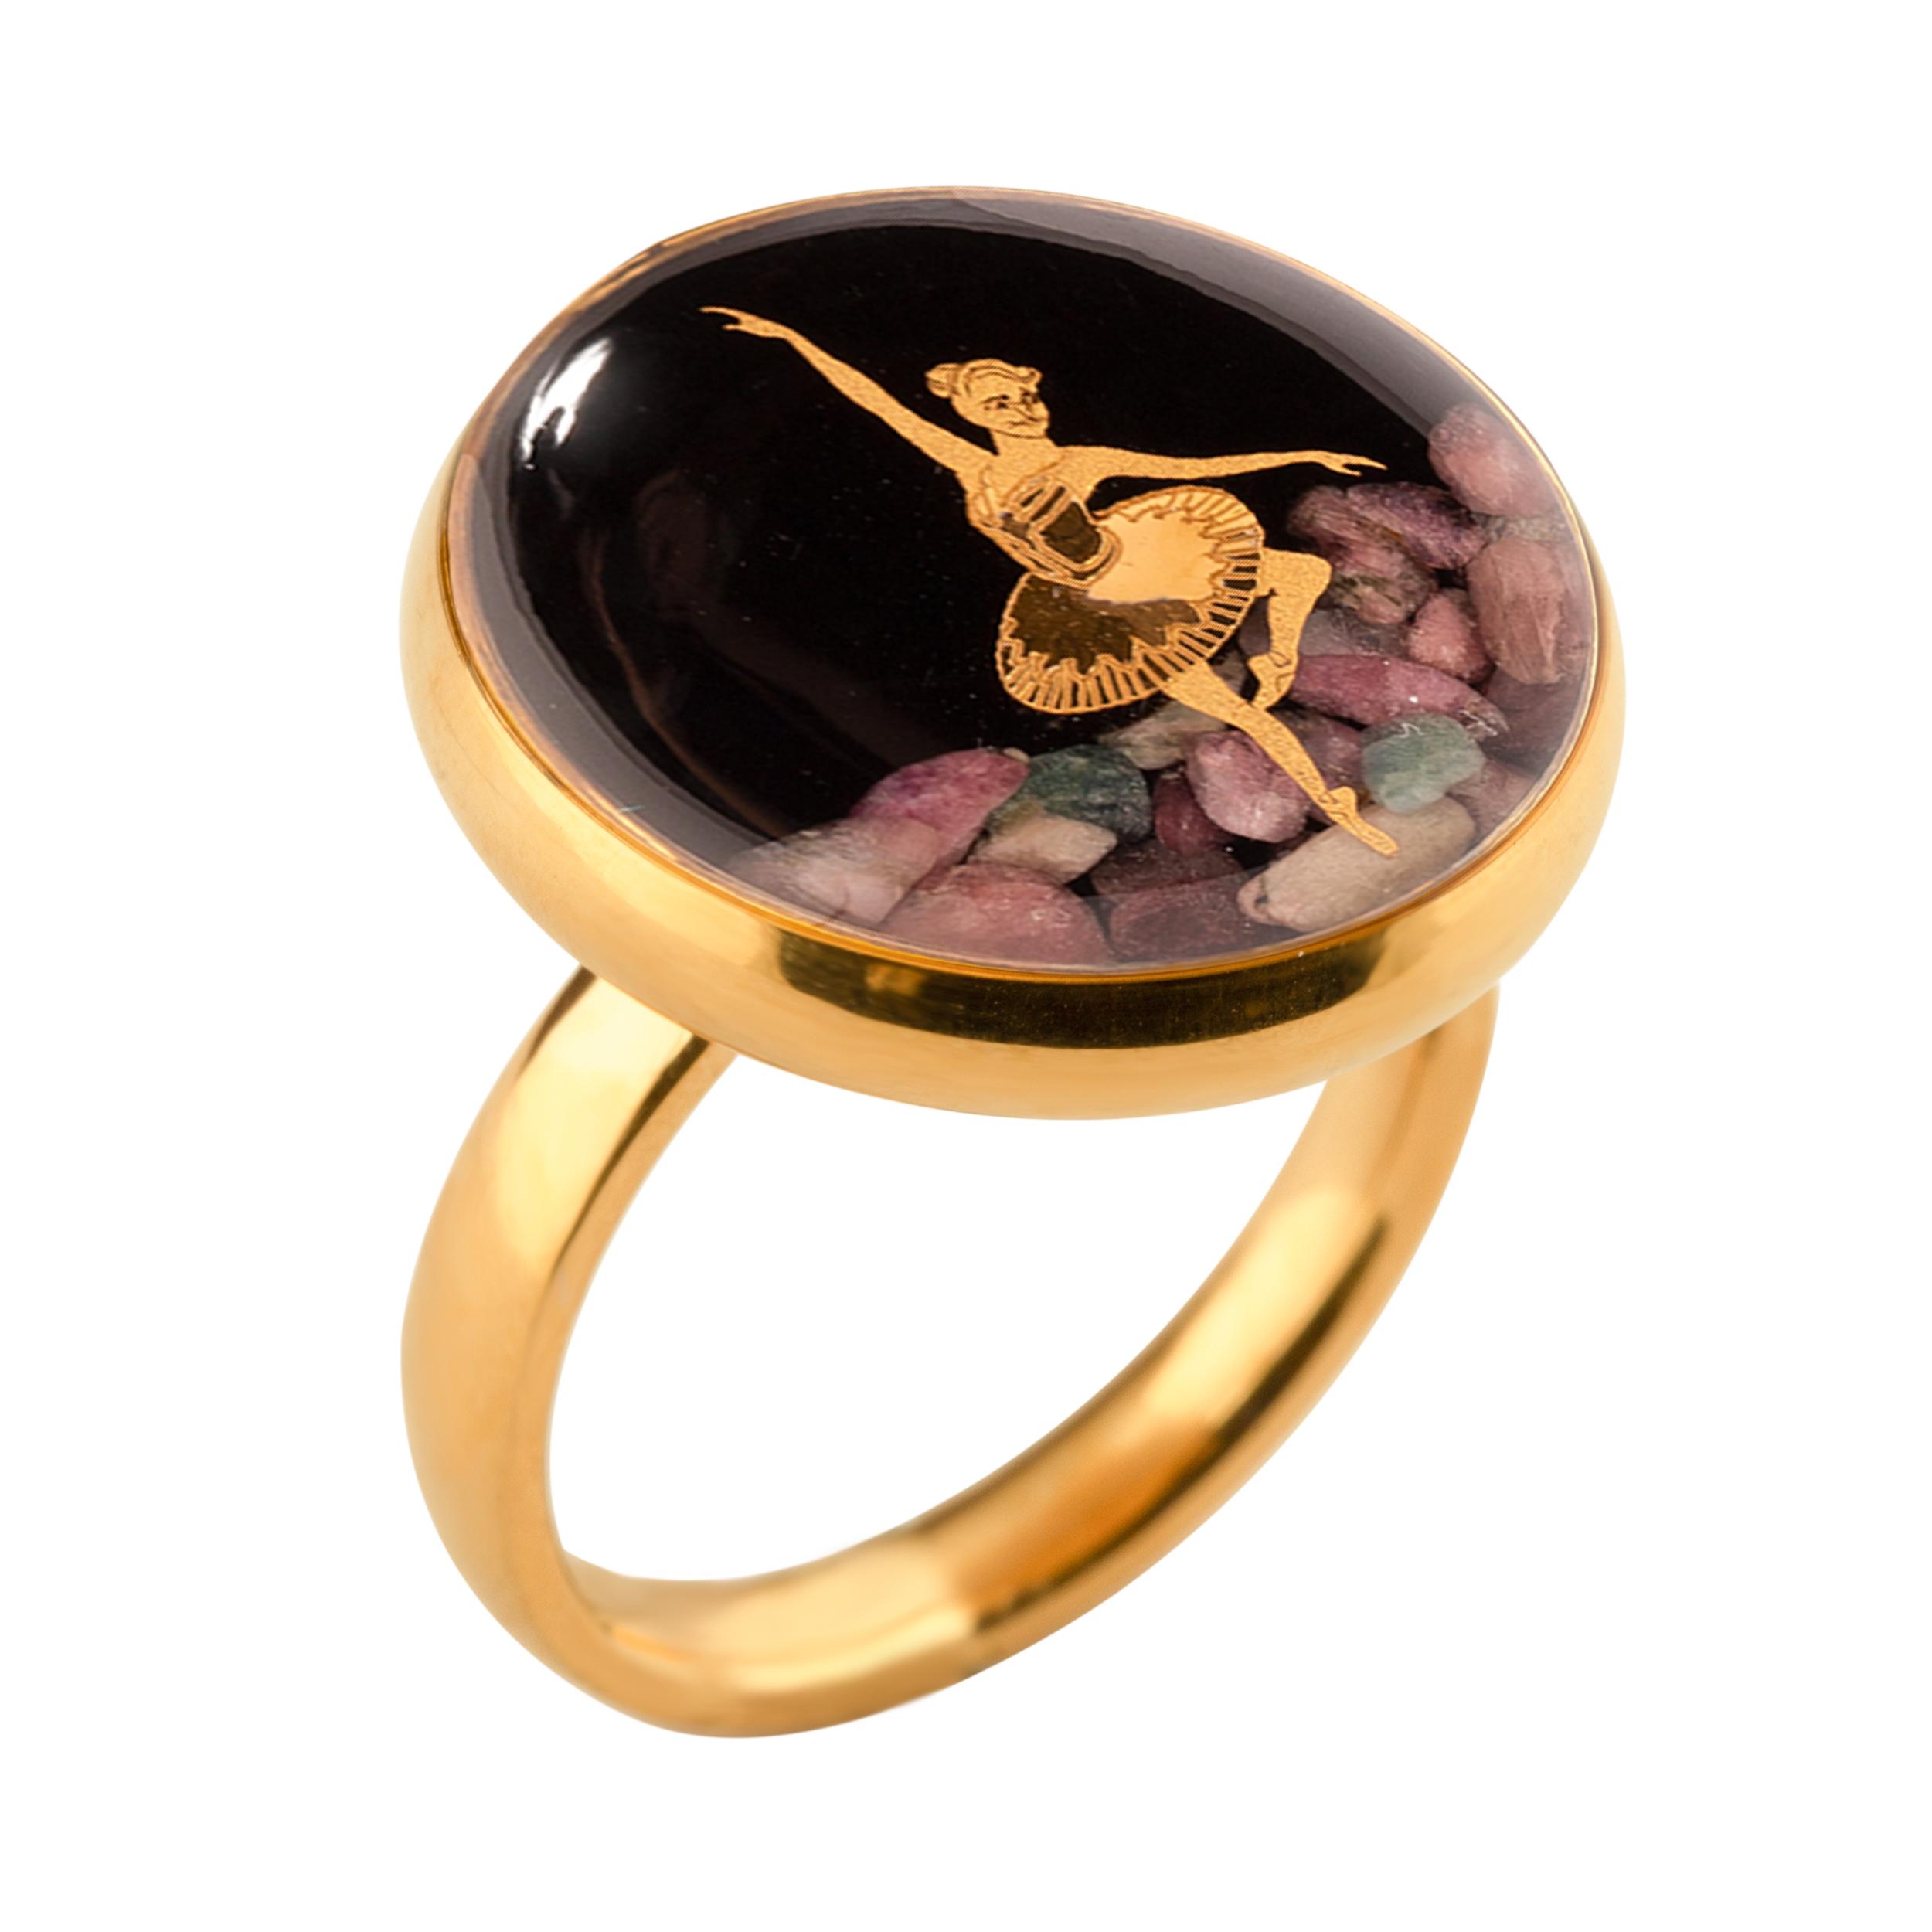 خرید                                      انگشتر طلا 24 عیار زنانه الون طرح رقص باله